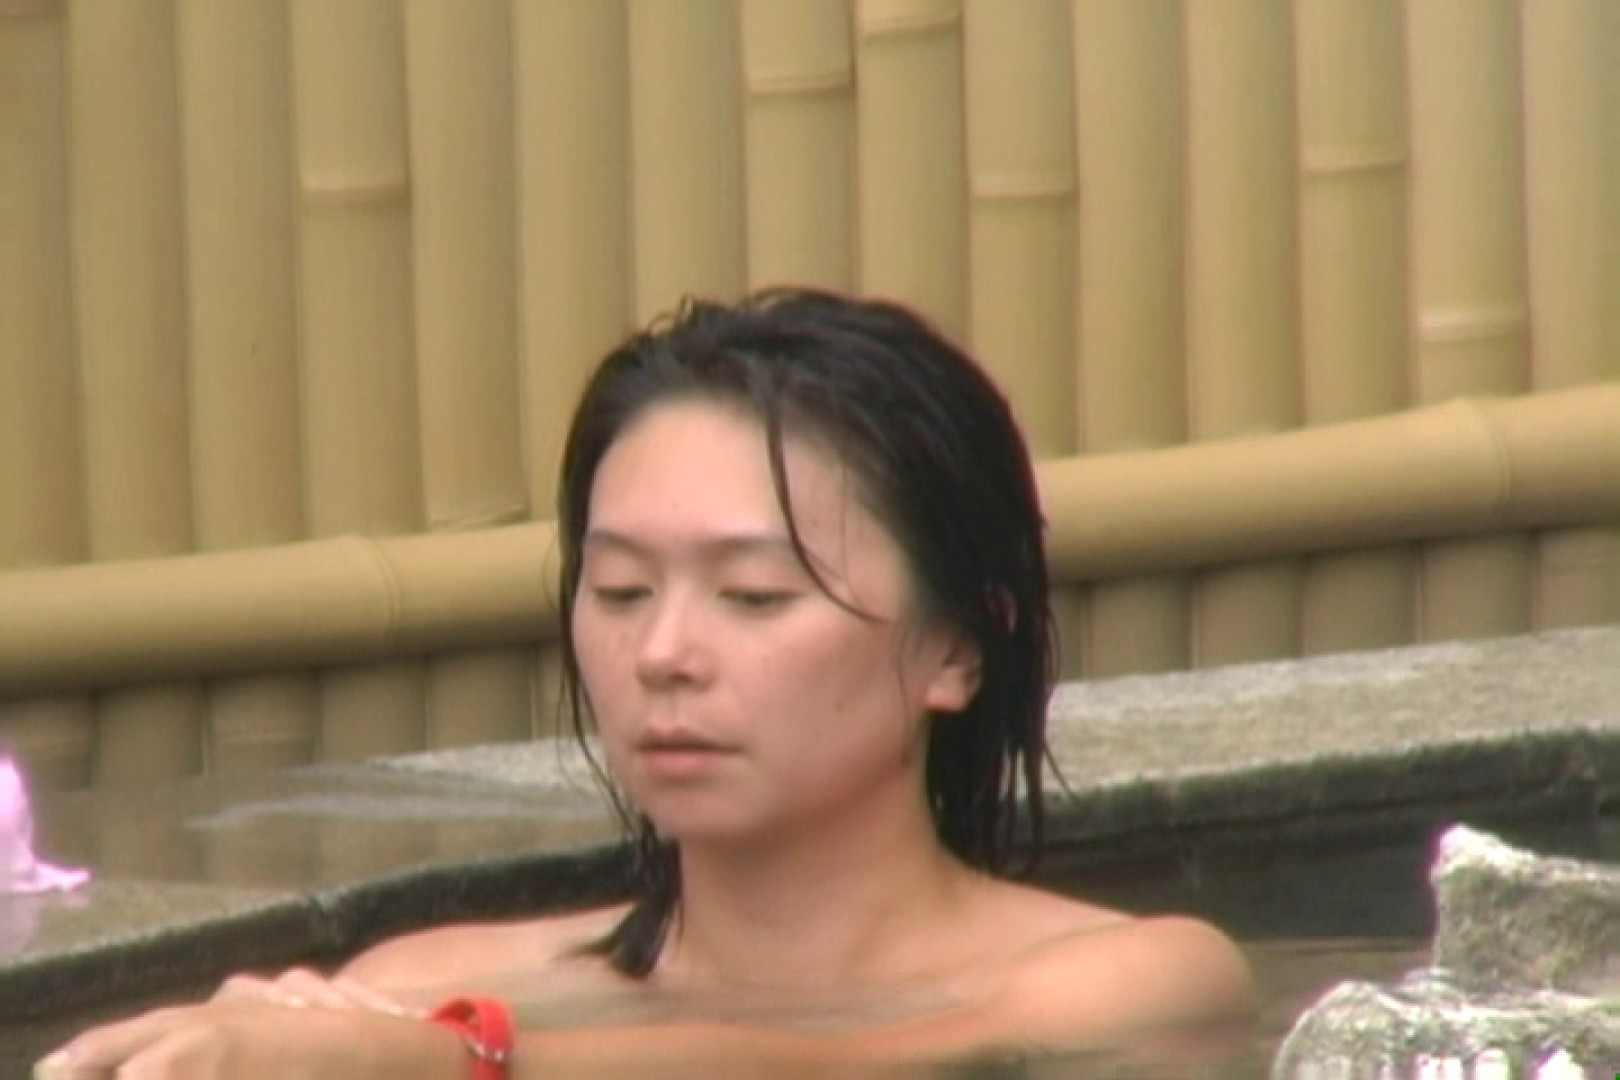 Aquaな露天風呂Vol.619 エッチな盗撮 ワレメ無修正動画無料 107pic 28